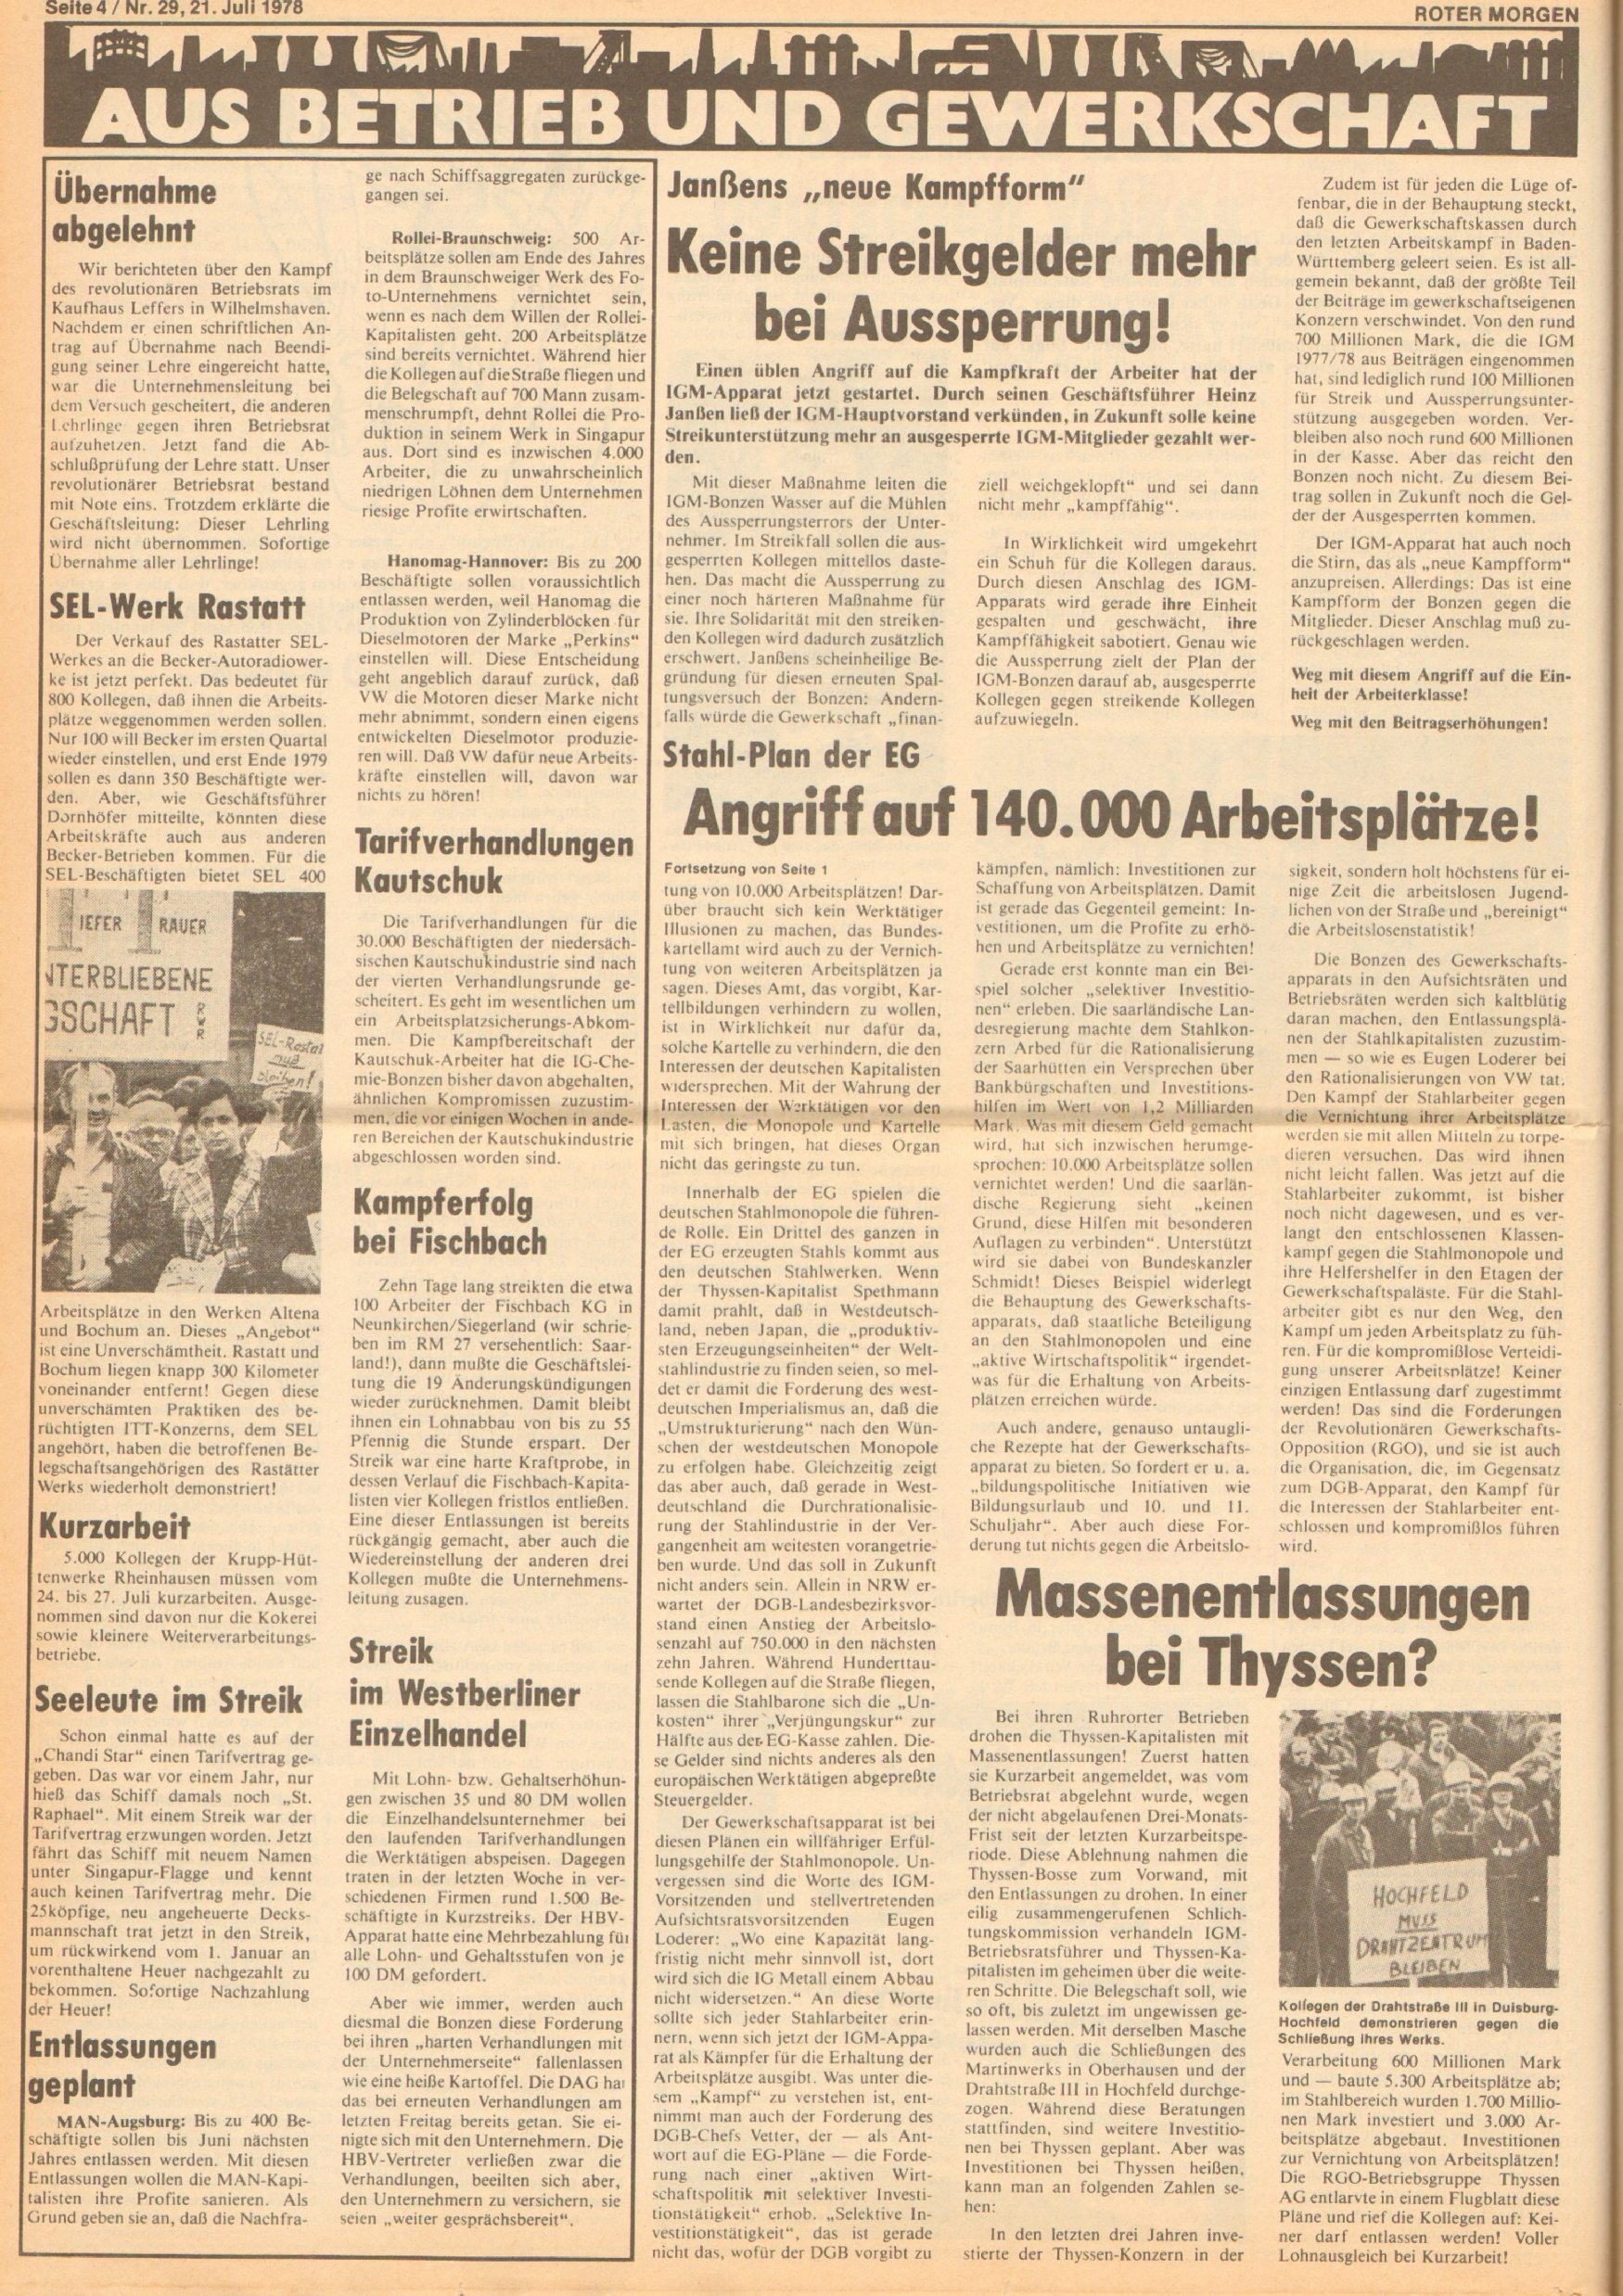 Roter Morgen, 12. Jg., 21. Juli 1978, Nr. 29, Seite 4